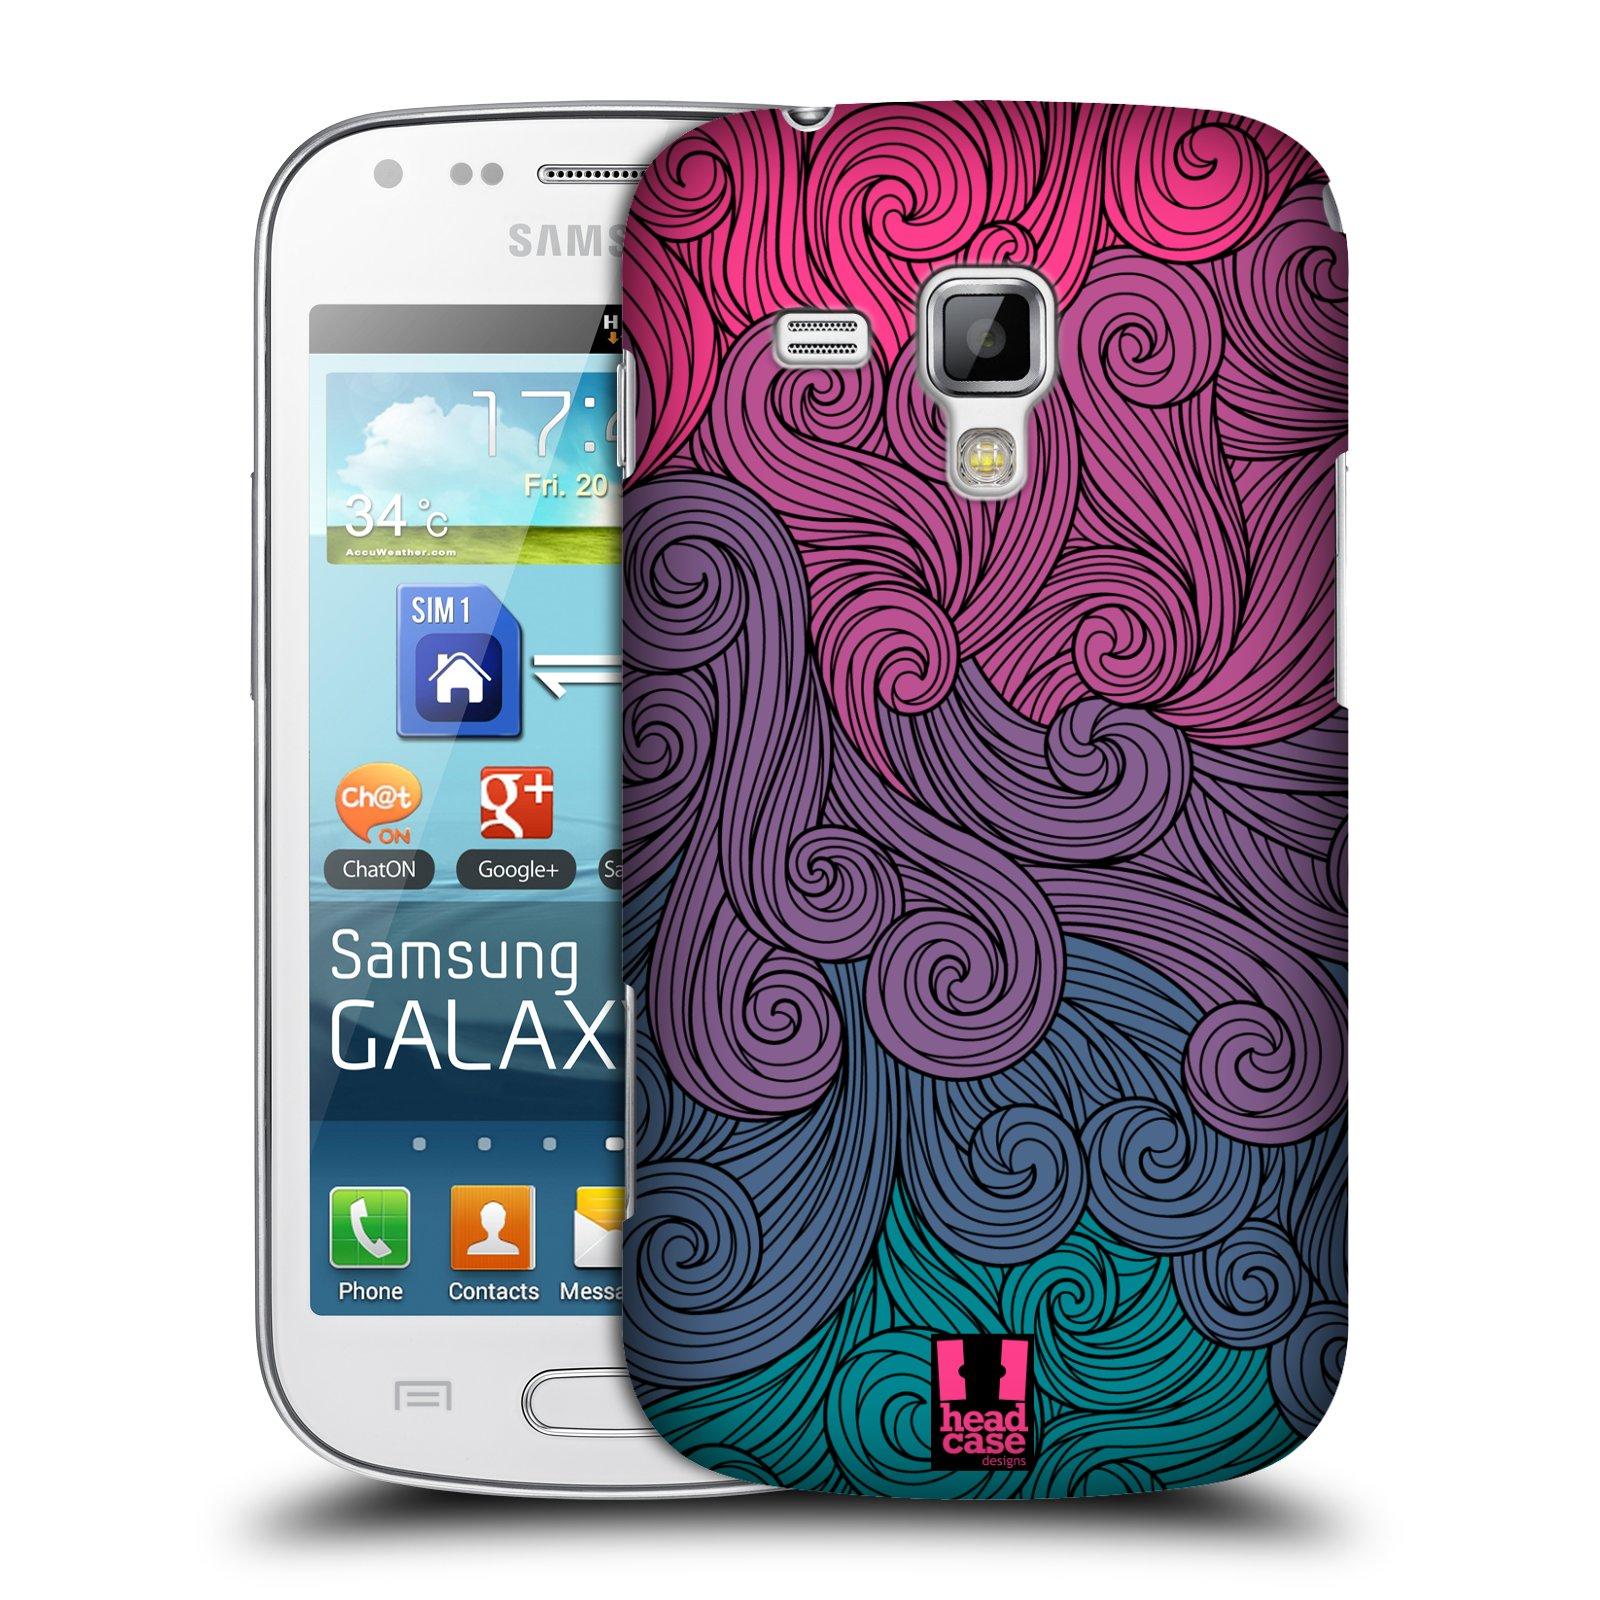 Plastové pouzdro na mobil Samsung Galaxy S Duos HEAD CASE Swirls Hot Pink (Kryt či obal na mobilní telefon Samsung Galaxy S Duos GT-S7562)